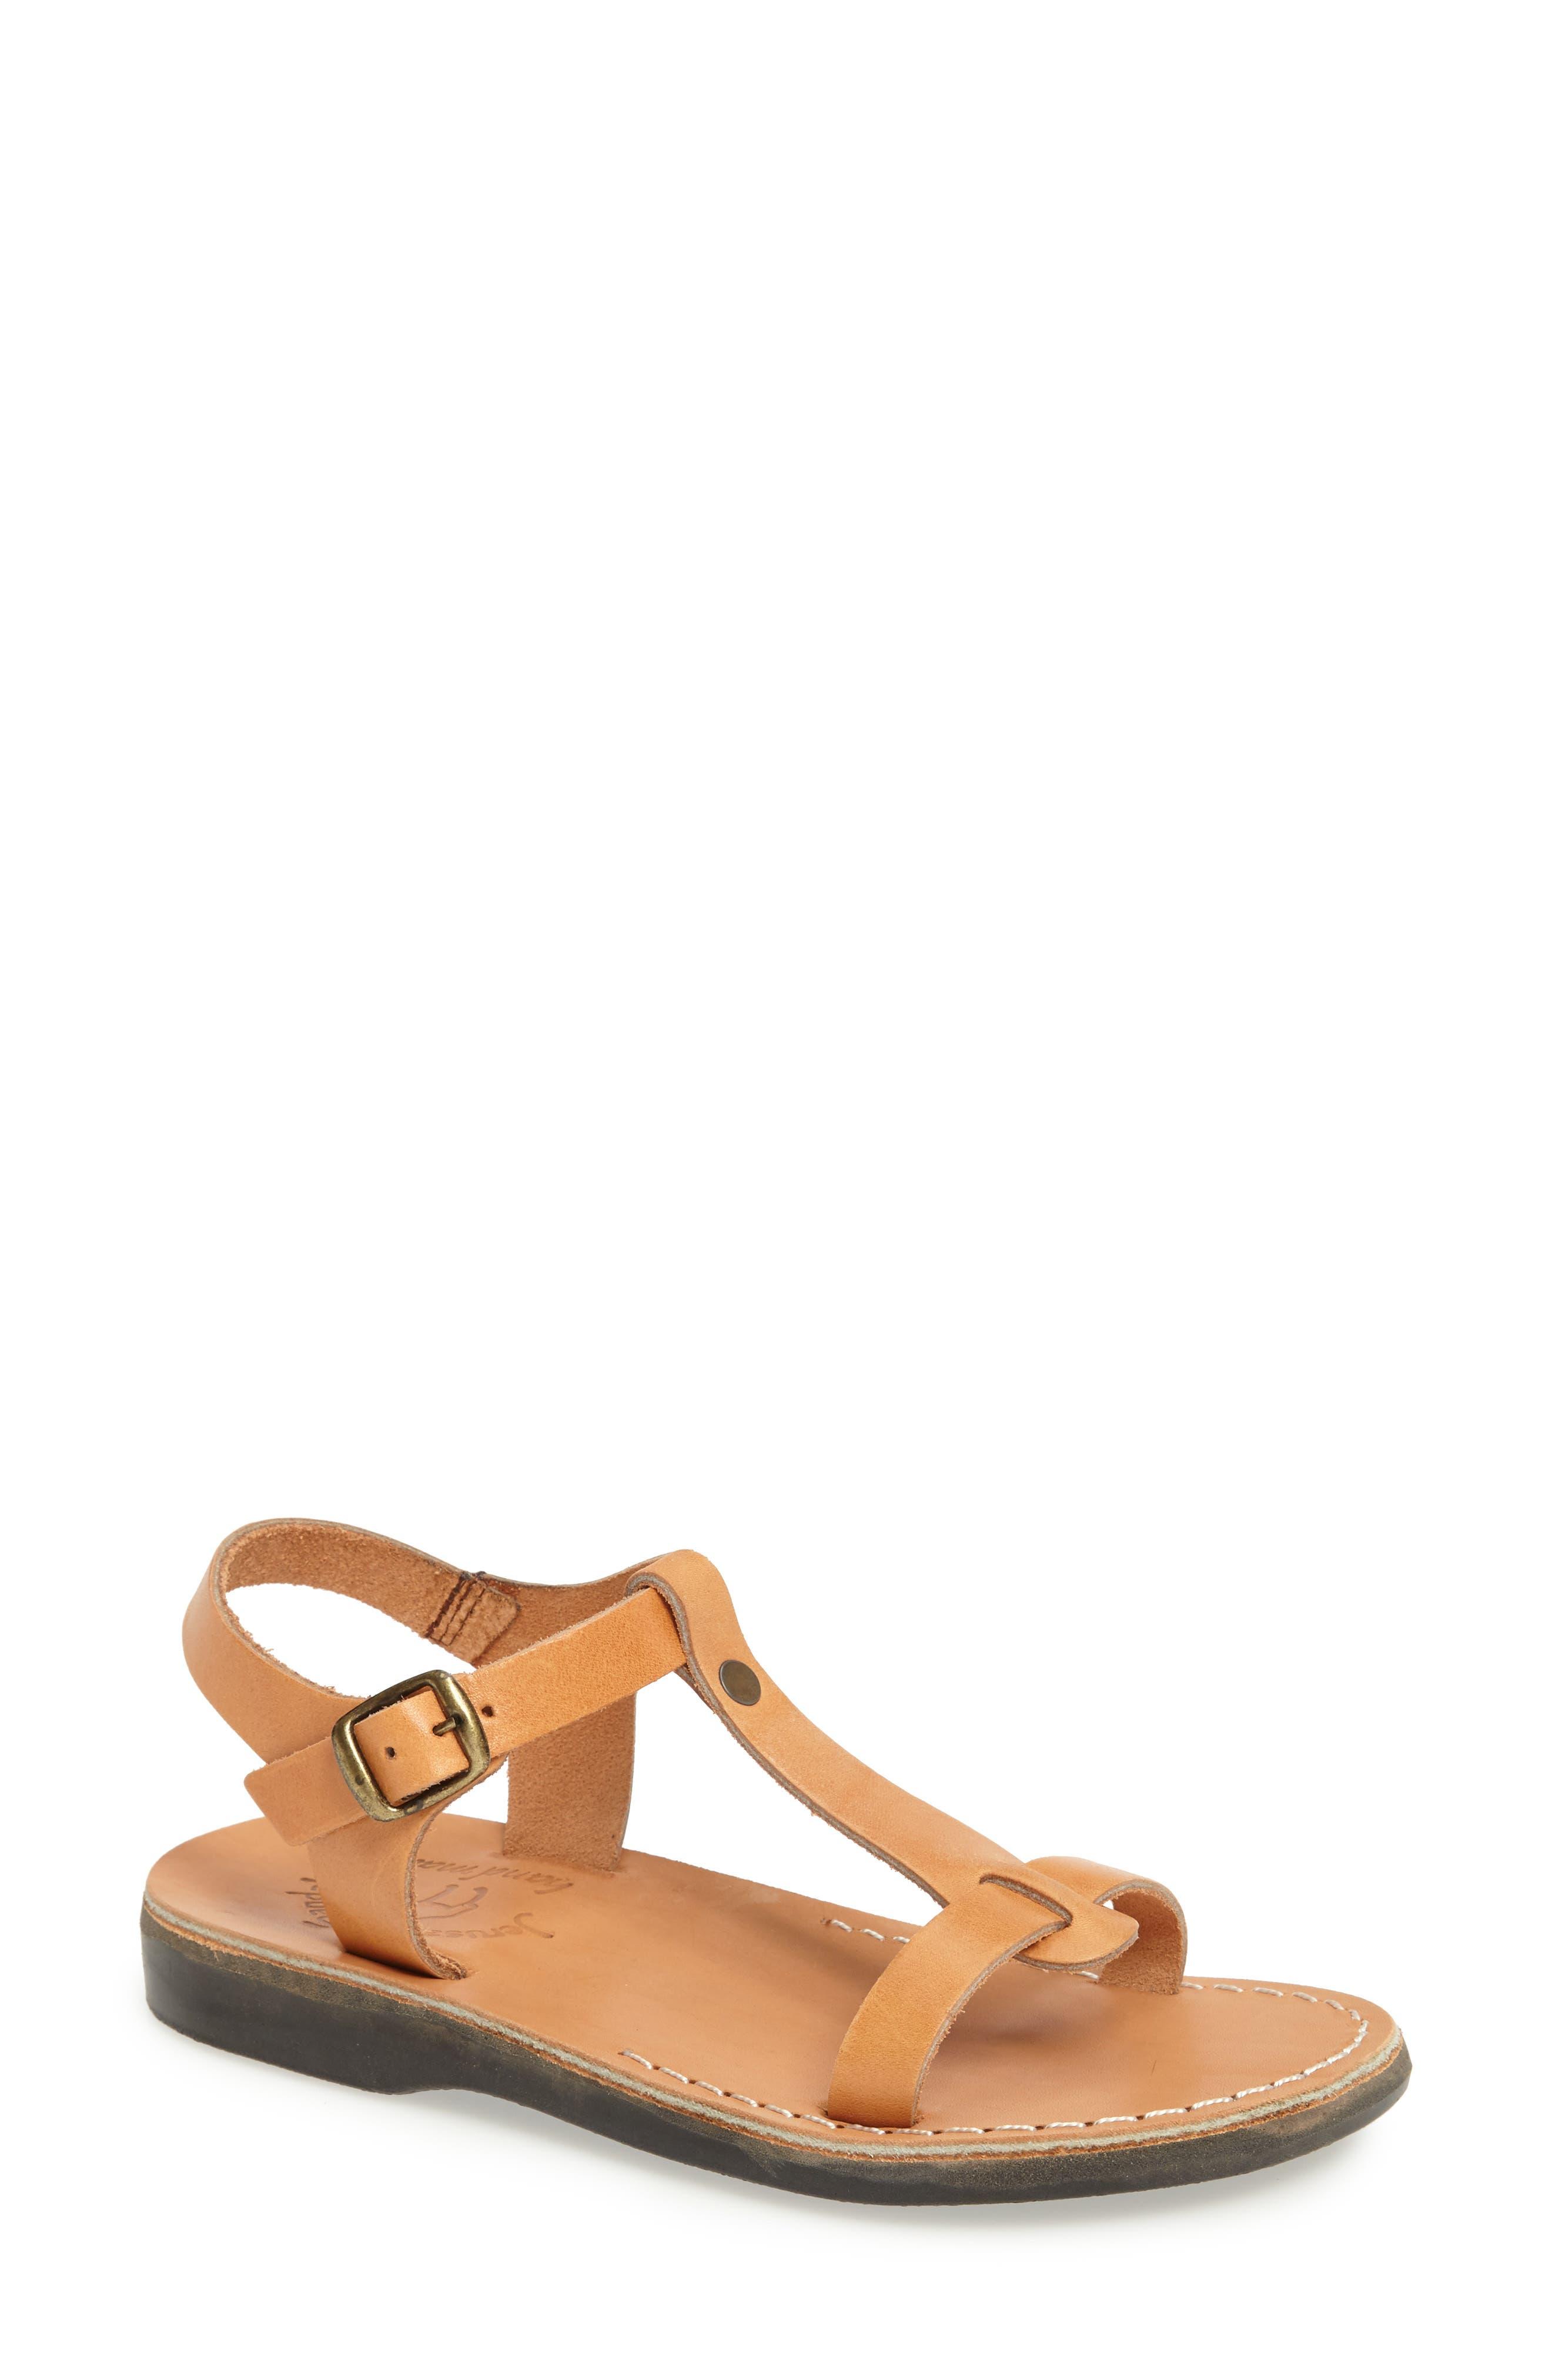 Bathsheba T-Strap Sandal,                             Main thumbnail 3, color,